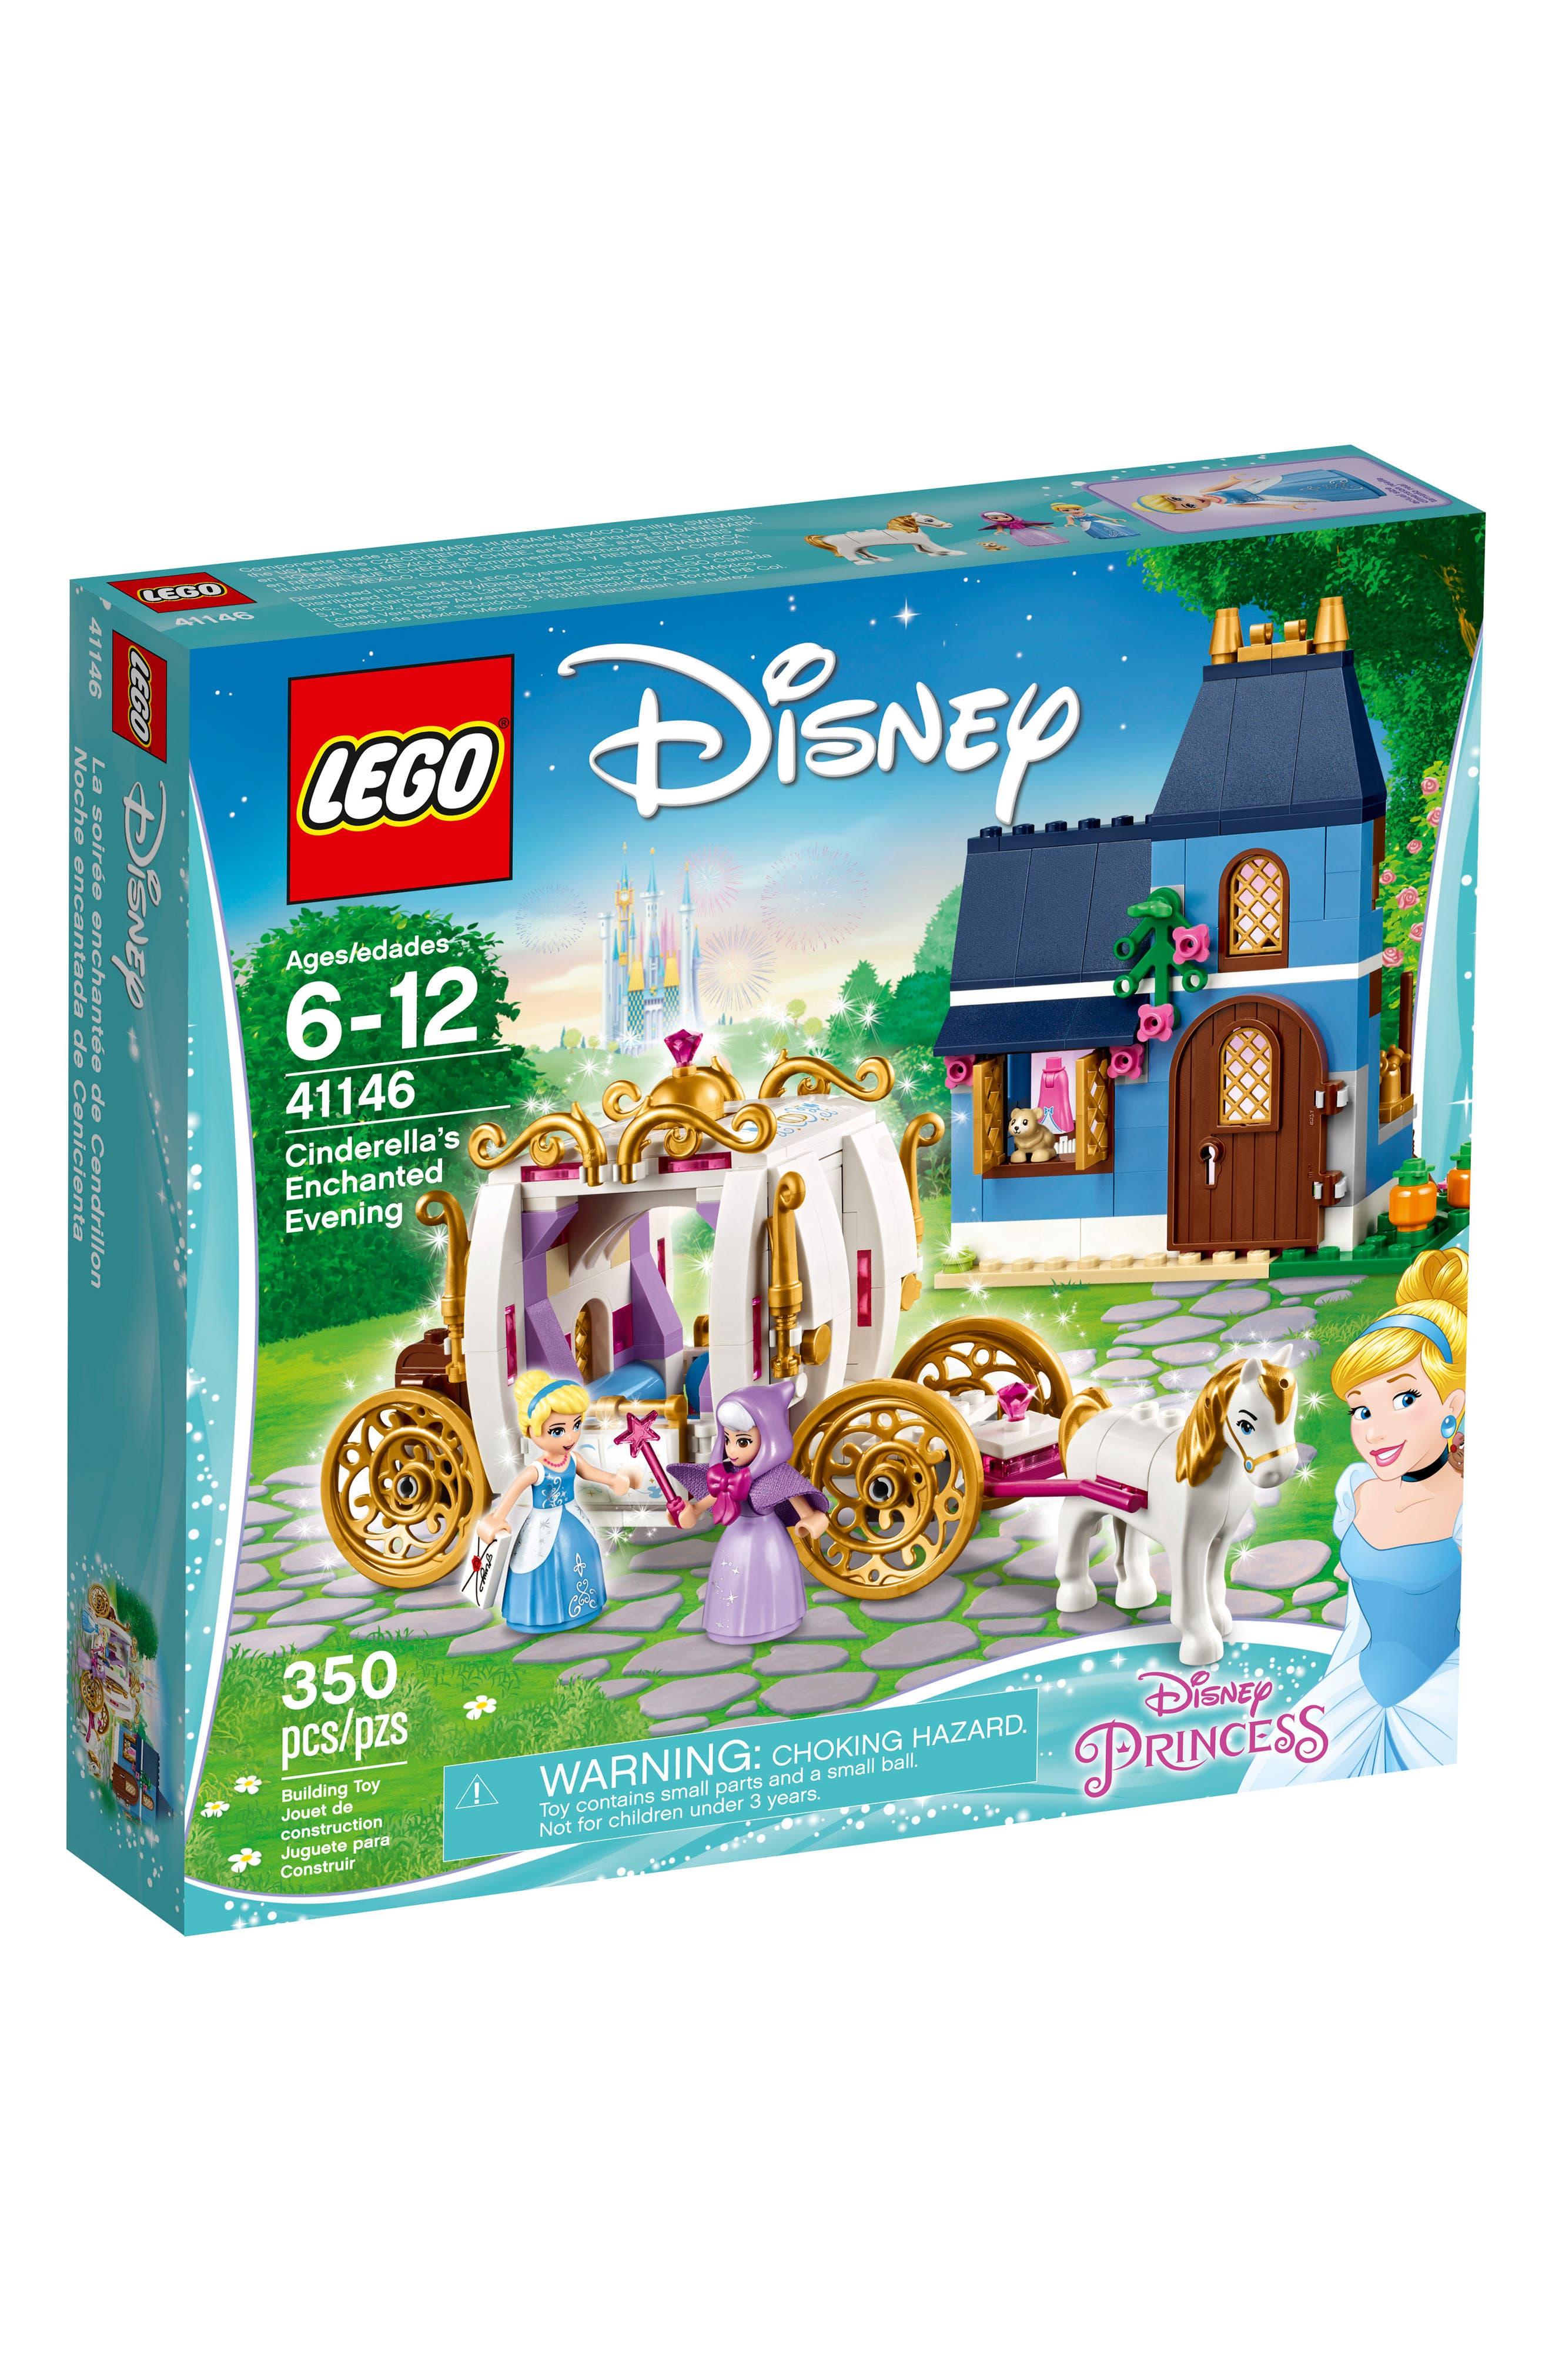 Alternate Image 1 Selected - LEGO® Disney™ Cinderella's Enchanted Evening Play Set - 41146